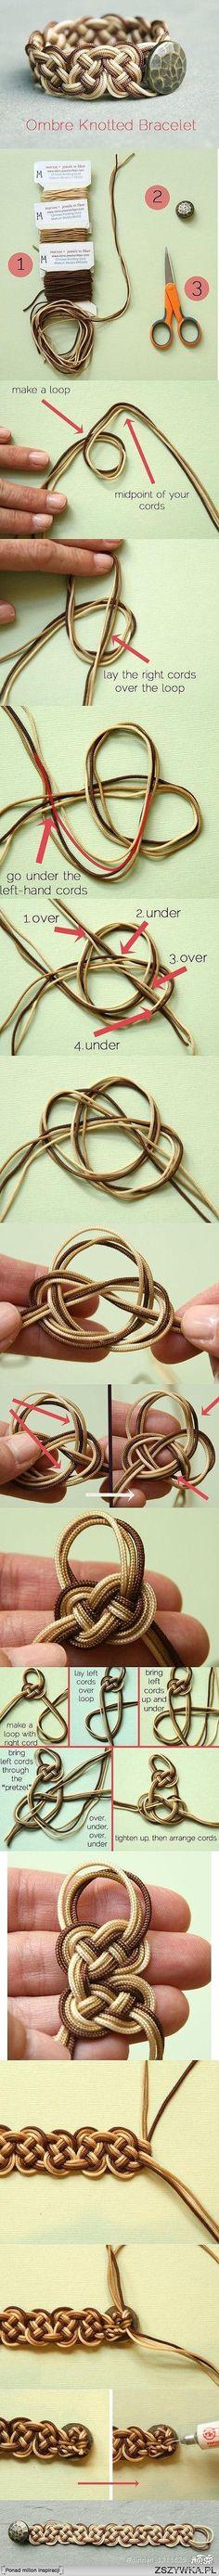 Ombre Knotted Bracelet